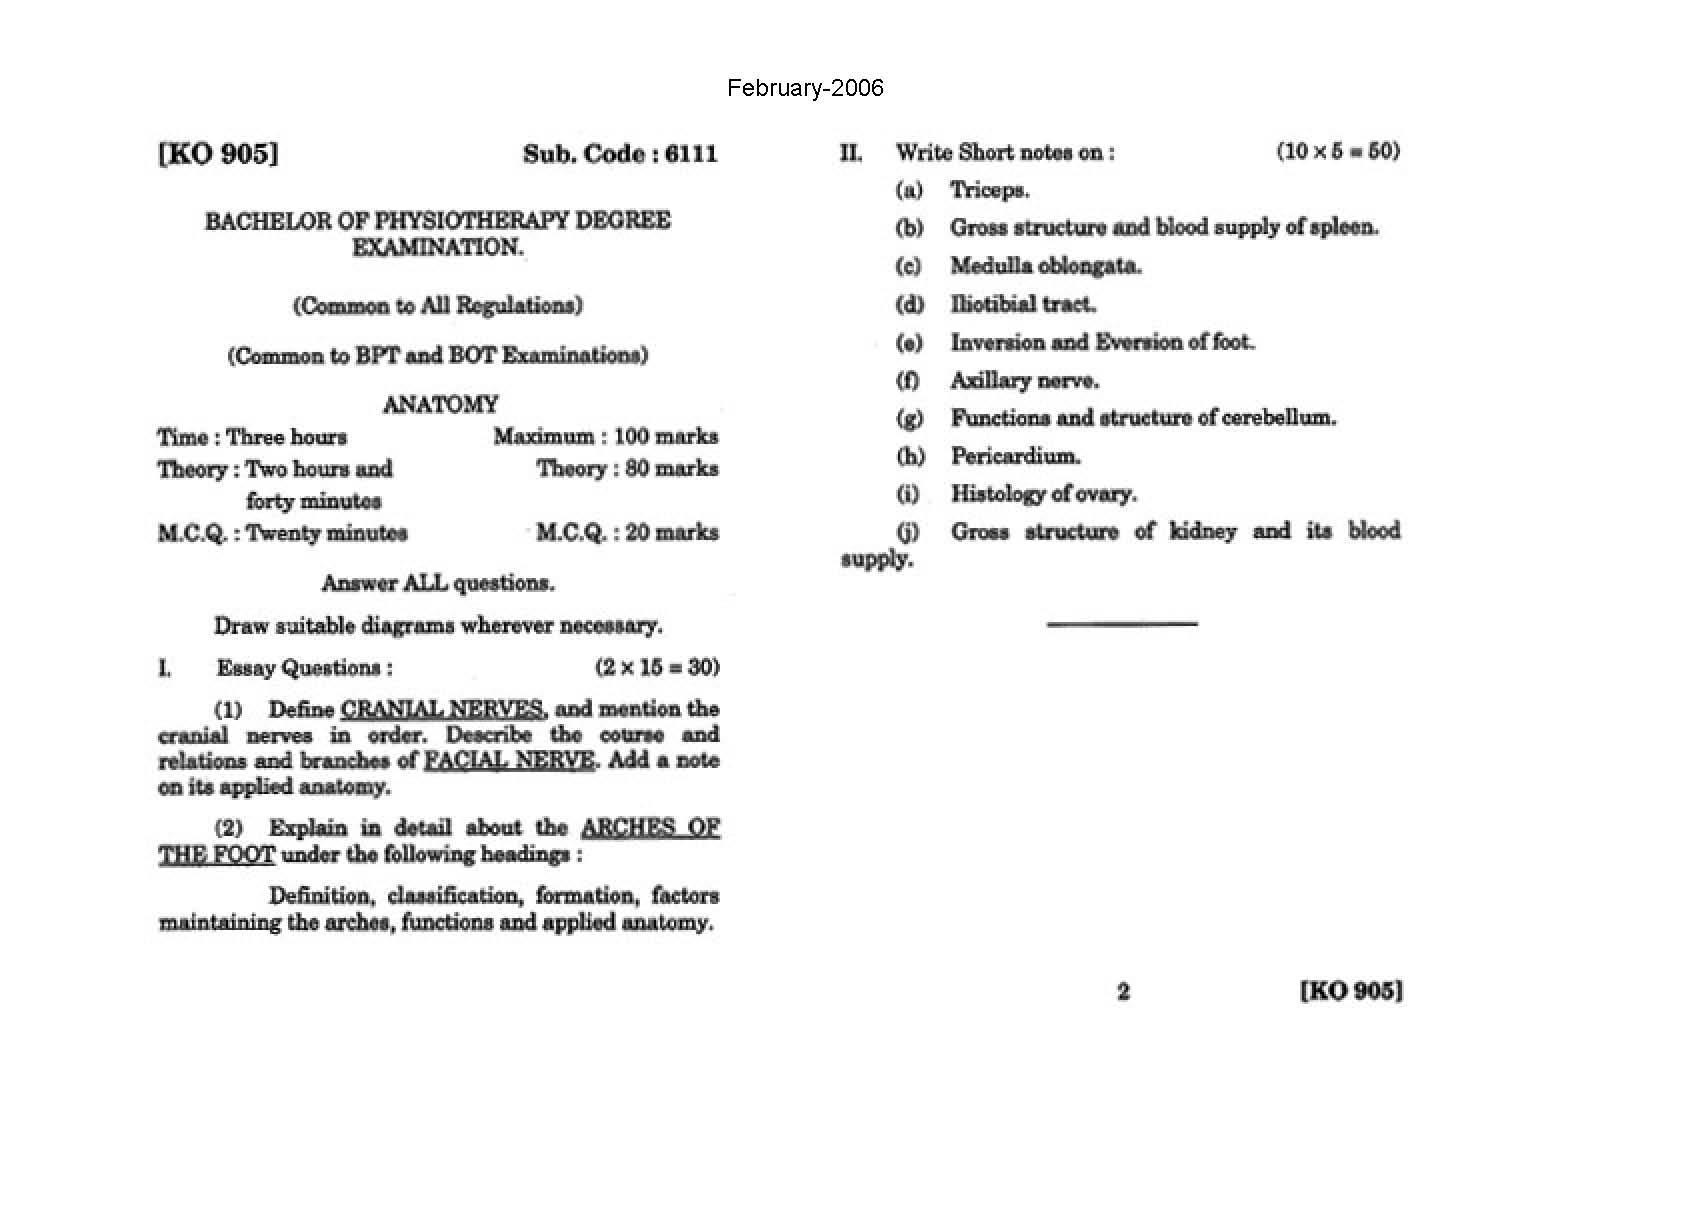 The Tamil Nadu Dr Mgr Medical University General Anatomy February